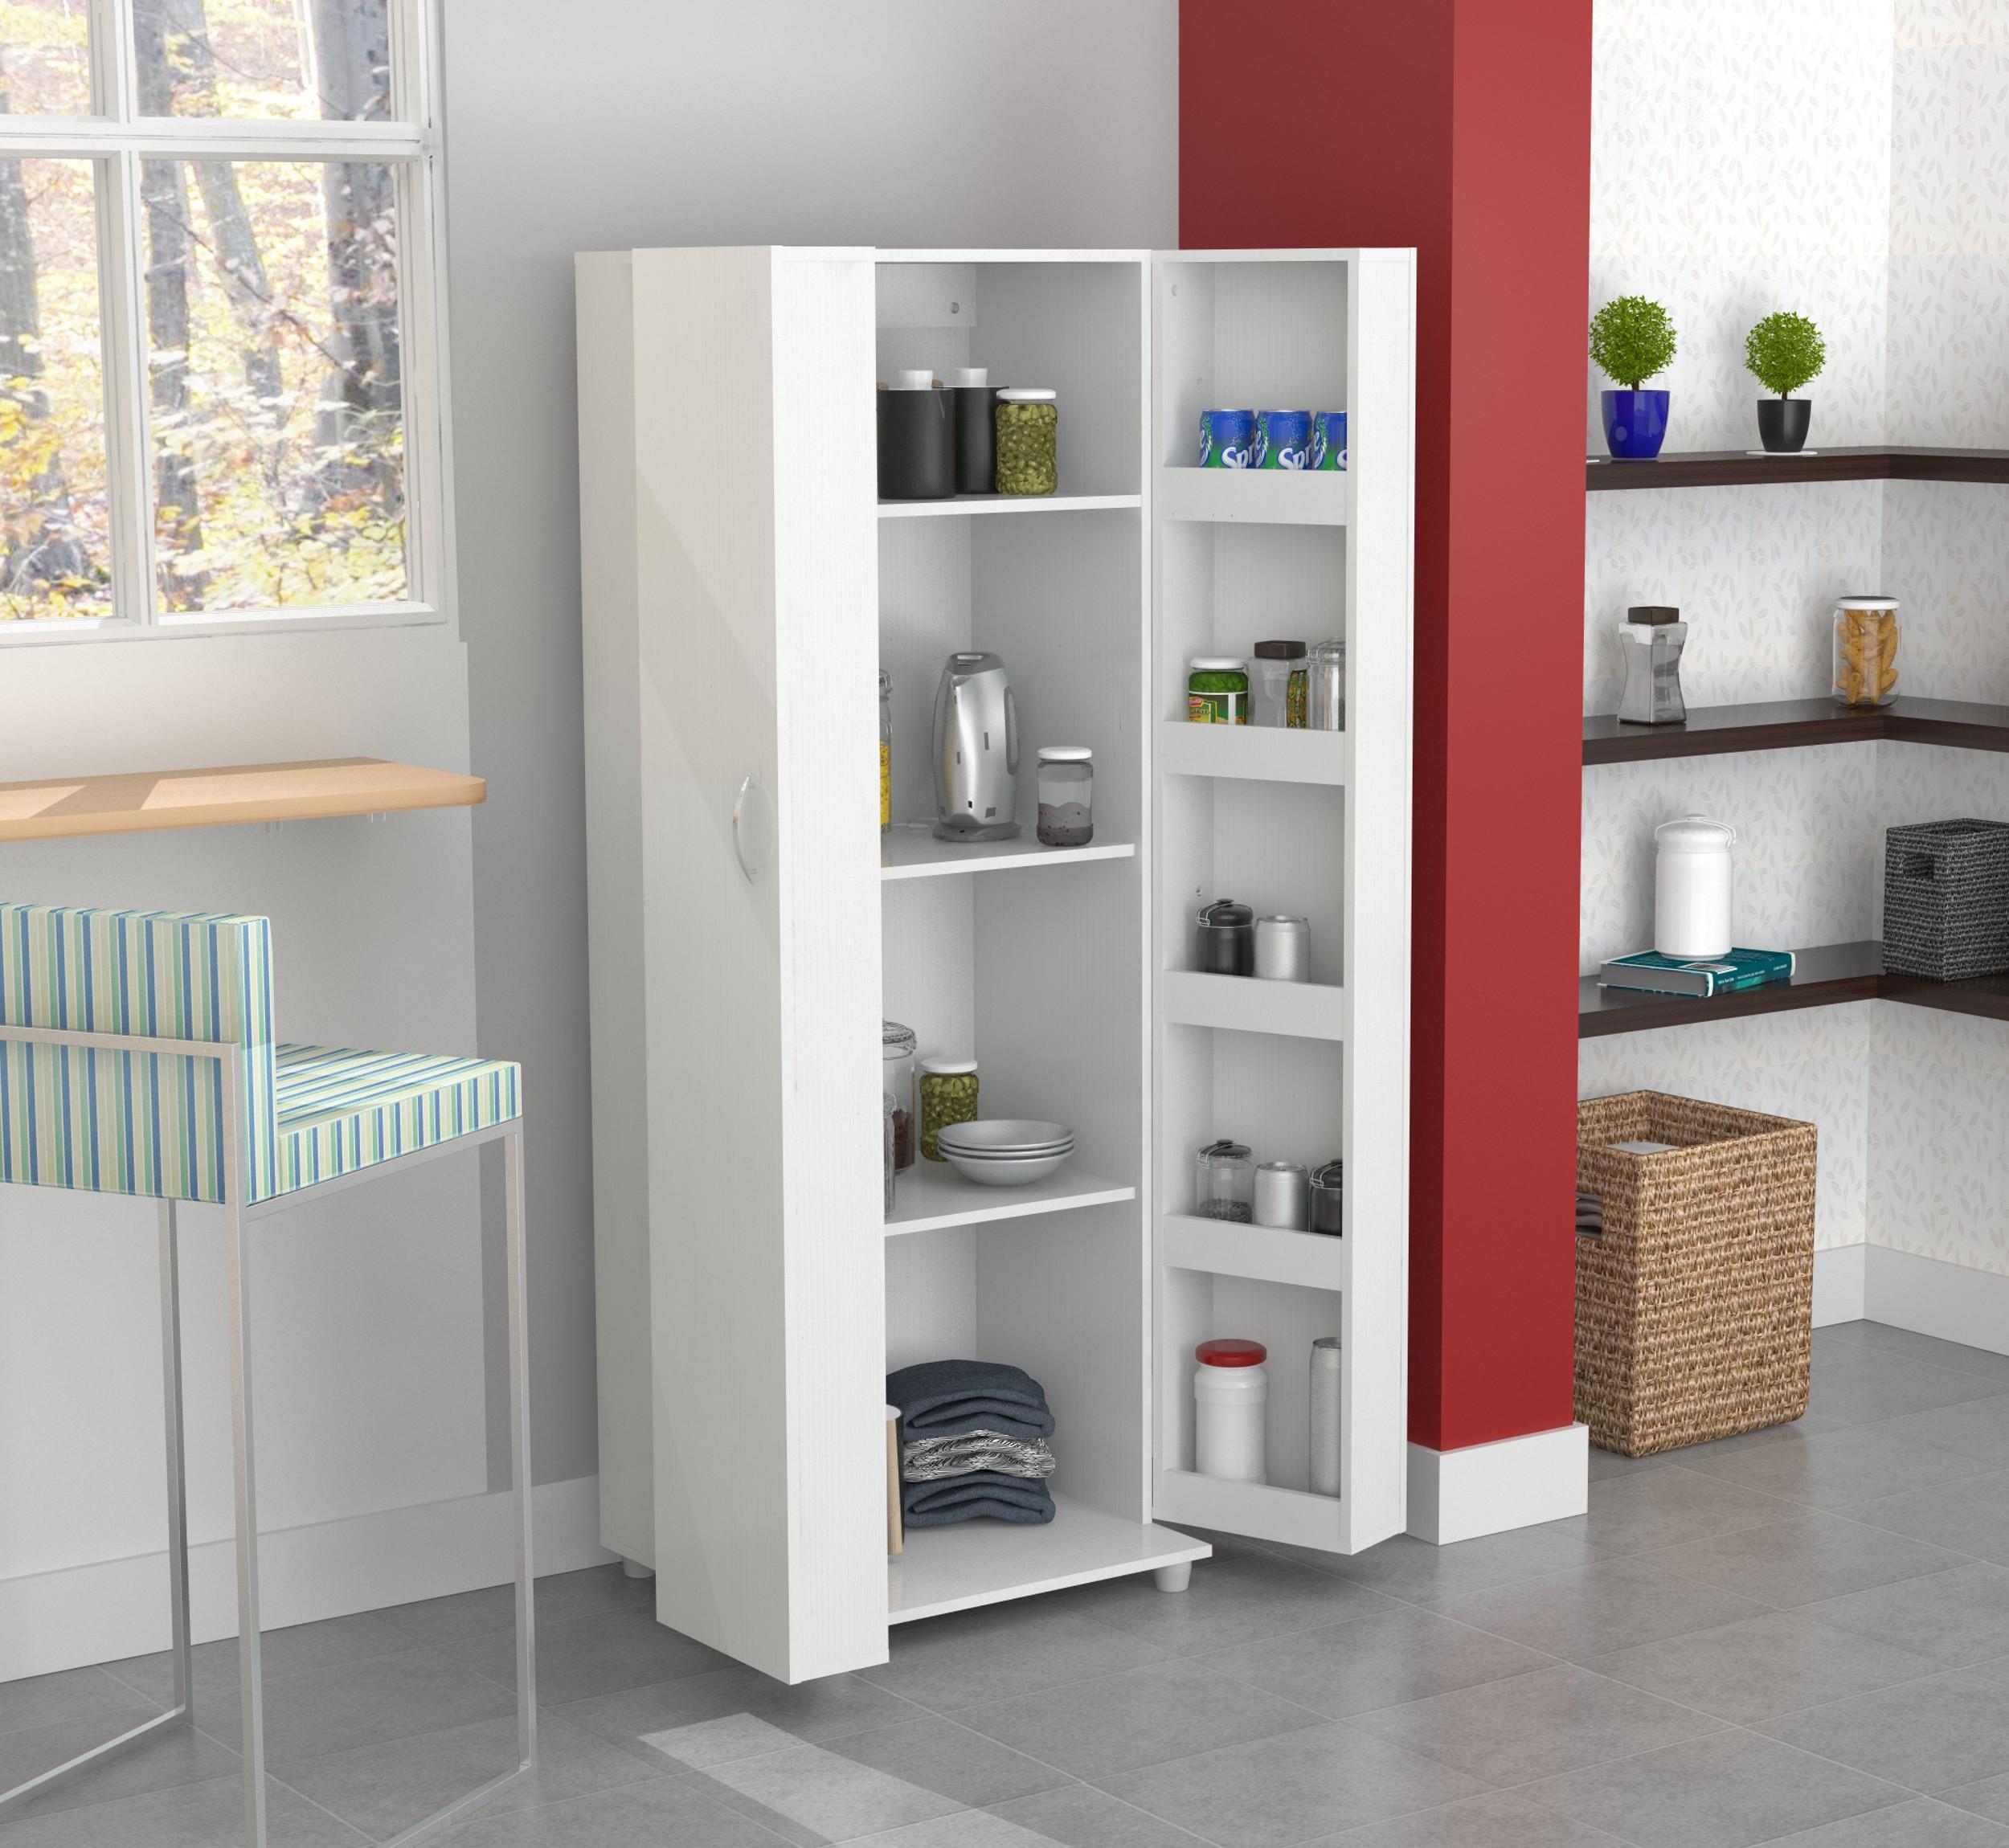 Inval Modern Laricina-white Kitchen Storage Pantry - Walmart.com